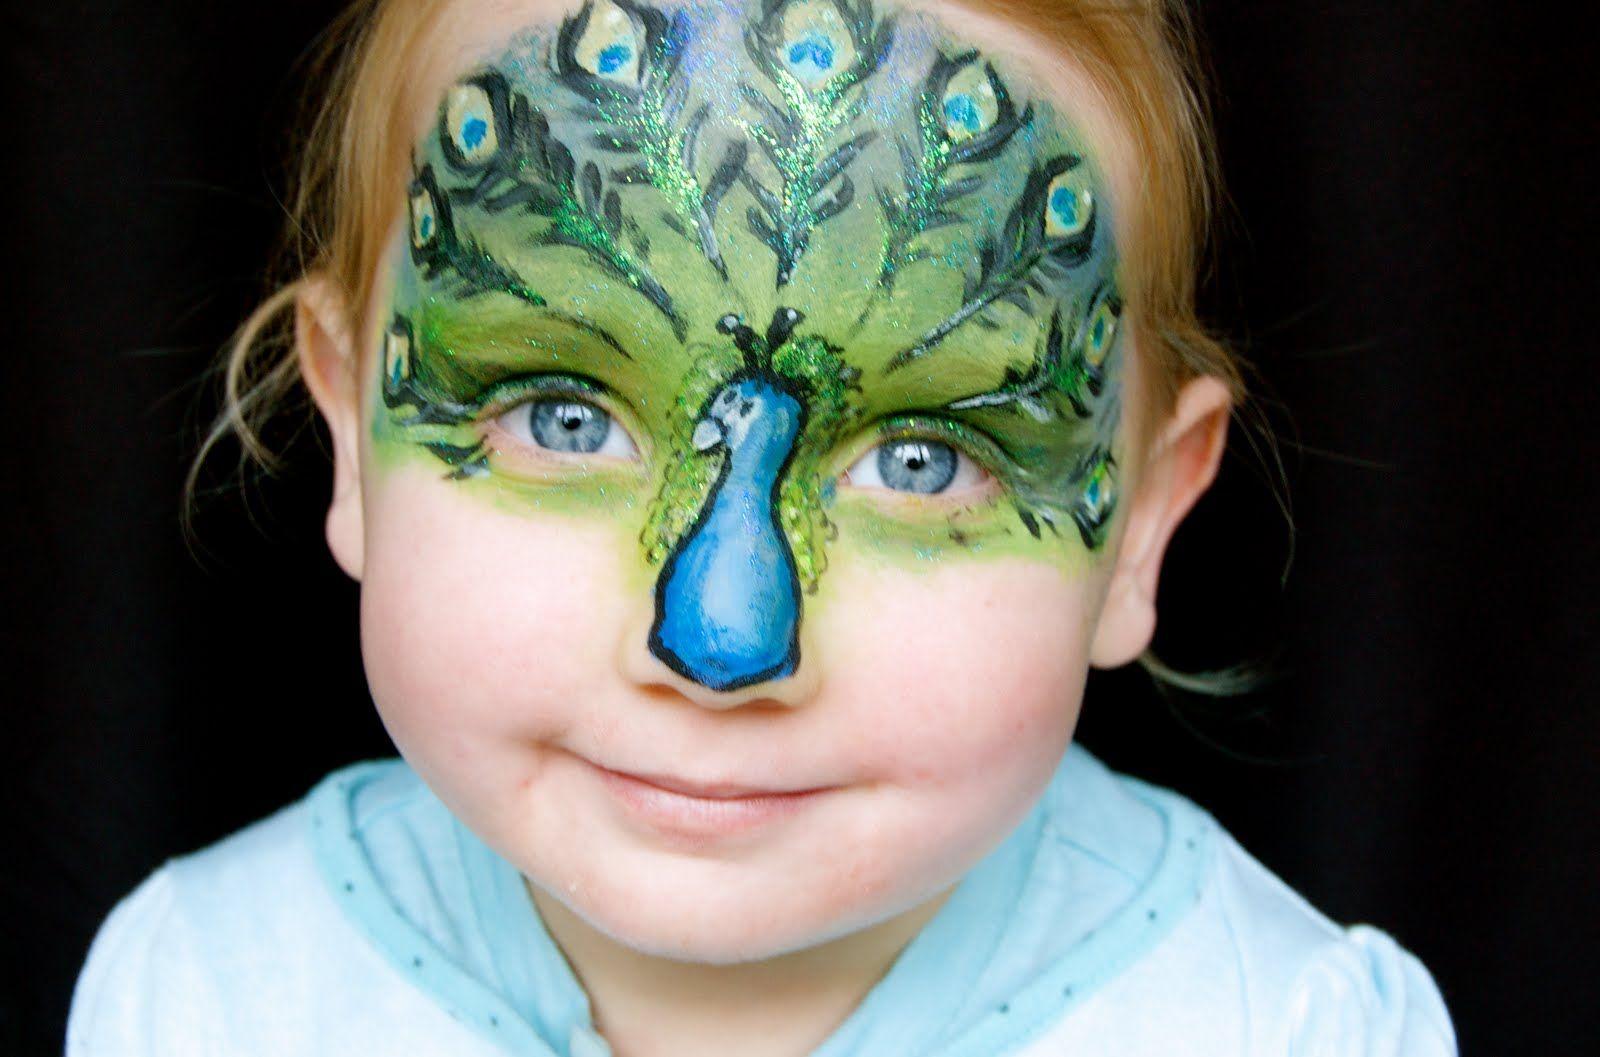 daizy design facepainting peacock karneval pinterest kinderschminken kinder schminken. Black Bedroom Furniture Sets. Home Design Ideas